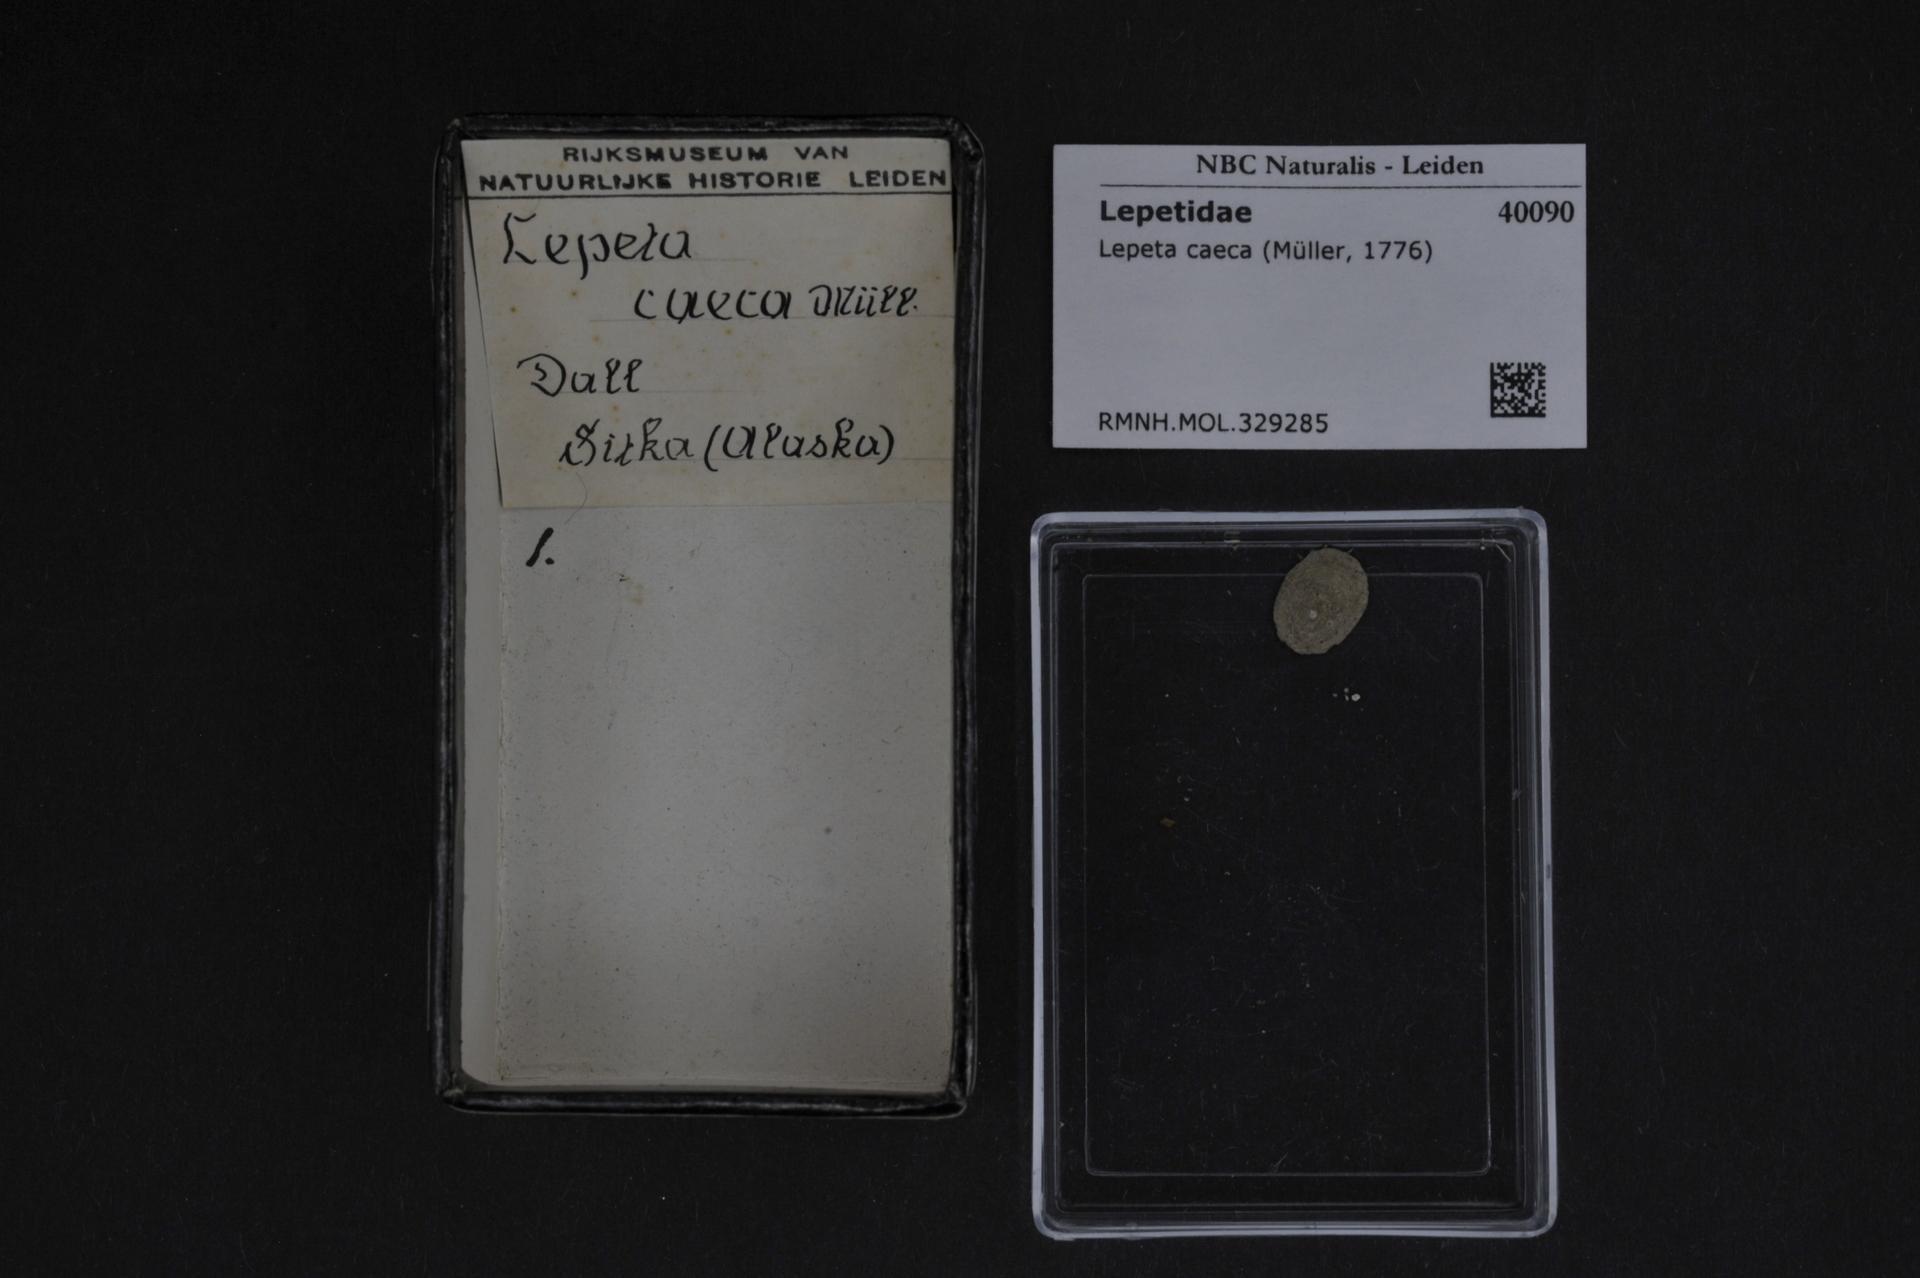 Image of Lepeta